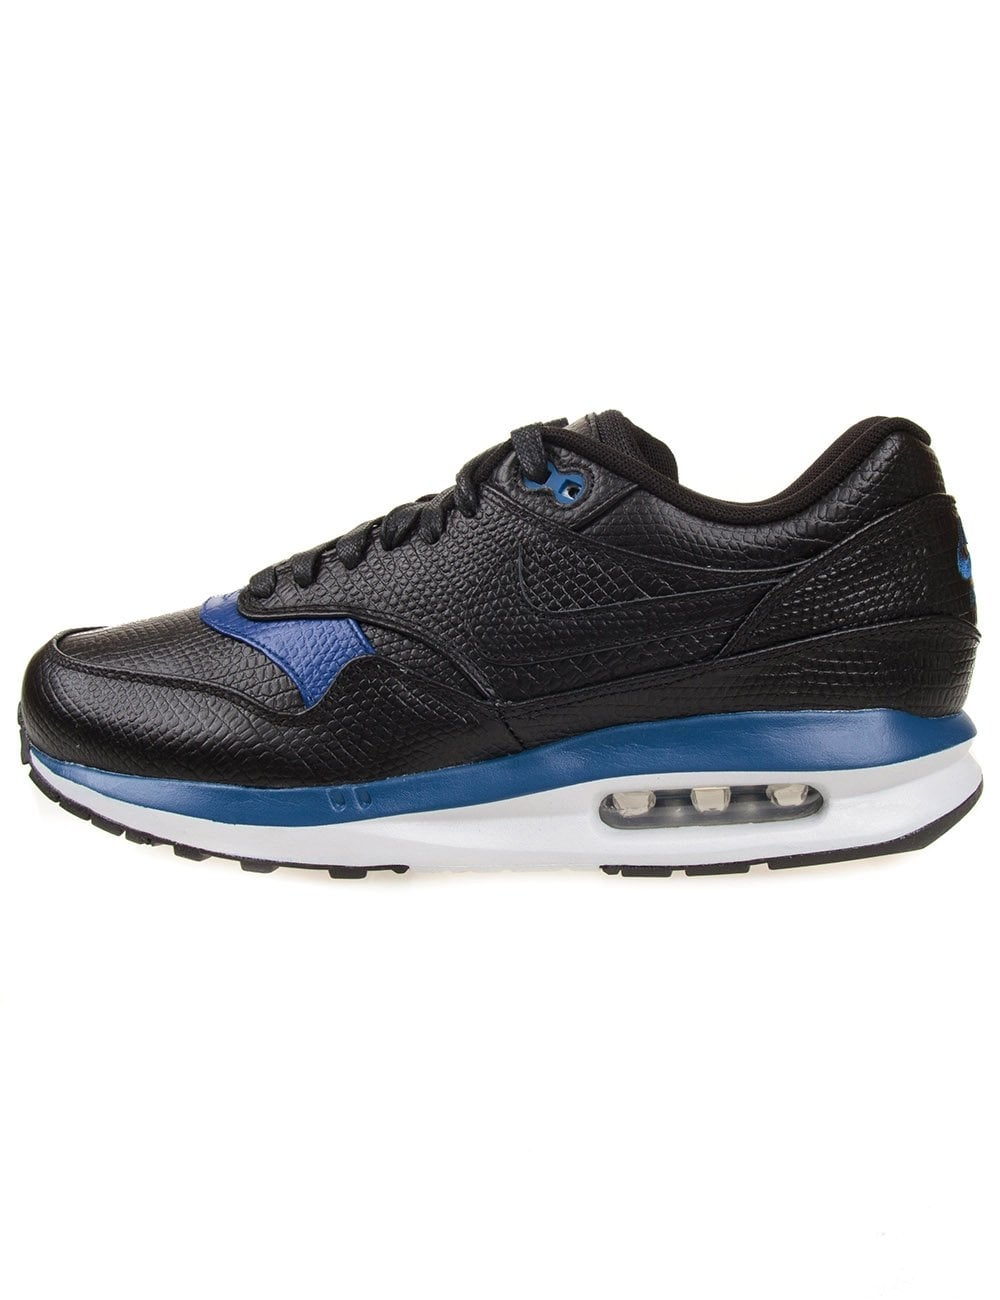 new product ea3e3 88e99 Air Max 1 Lunar Deluxe - Black